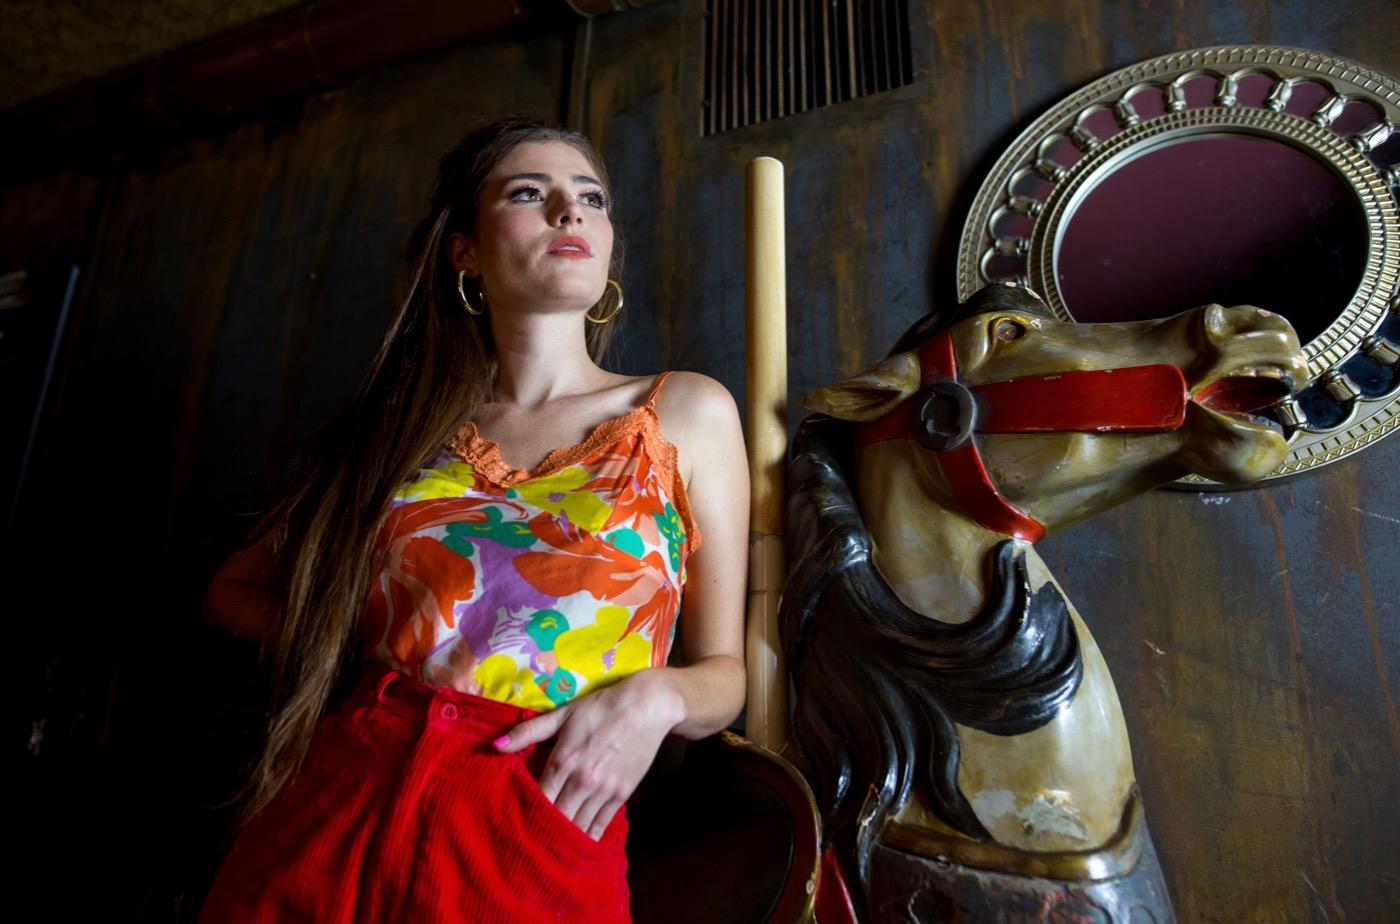 Honeycraft, Portrait @ Madame Siam 11/17/18. Photo by Derrick K. Lee, Esq. (@Methodman13) for www.BlurredCulture.com.